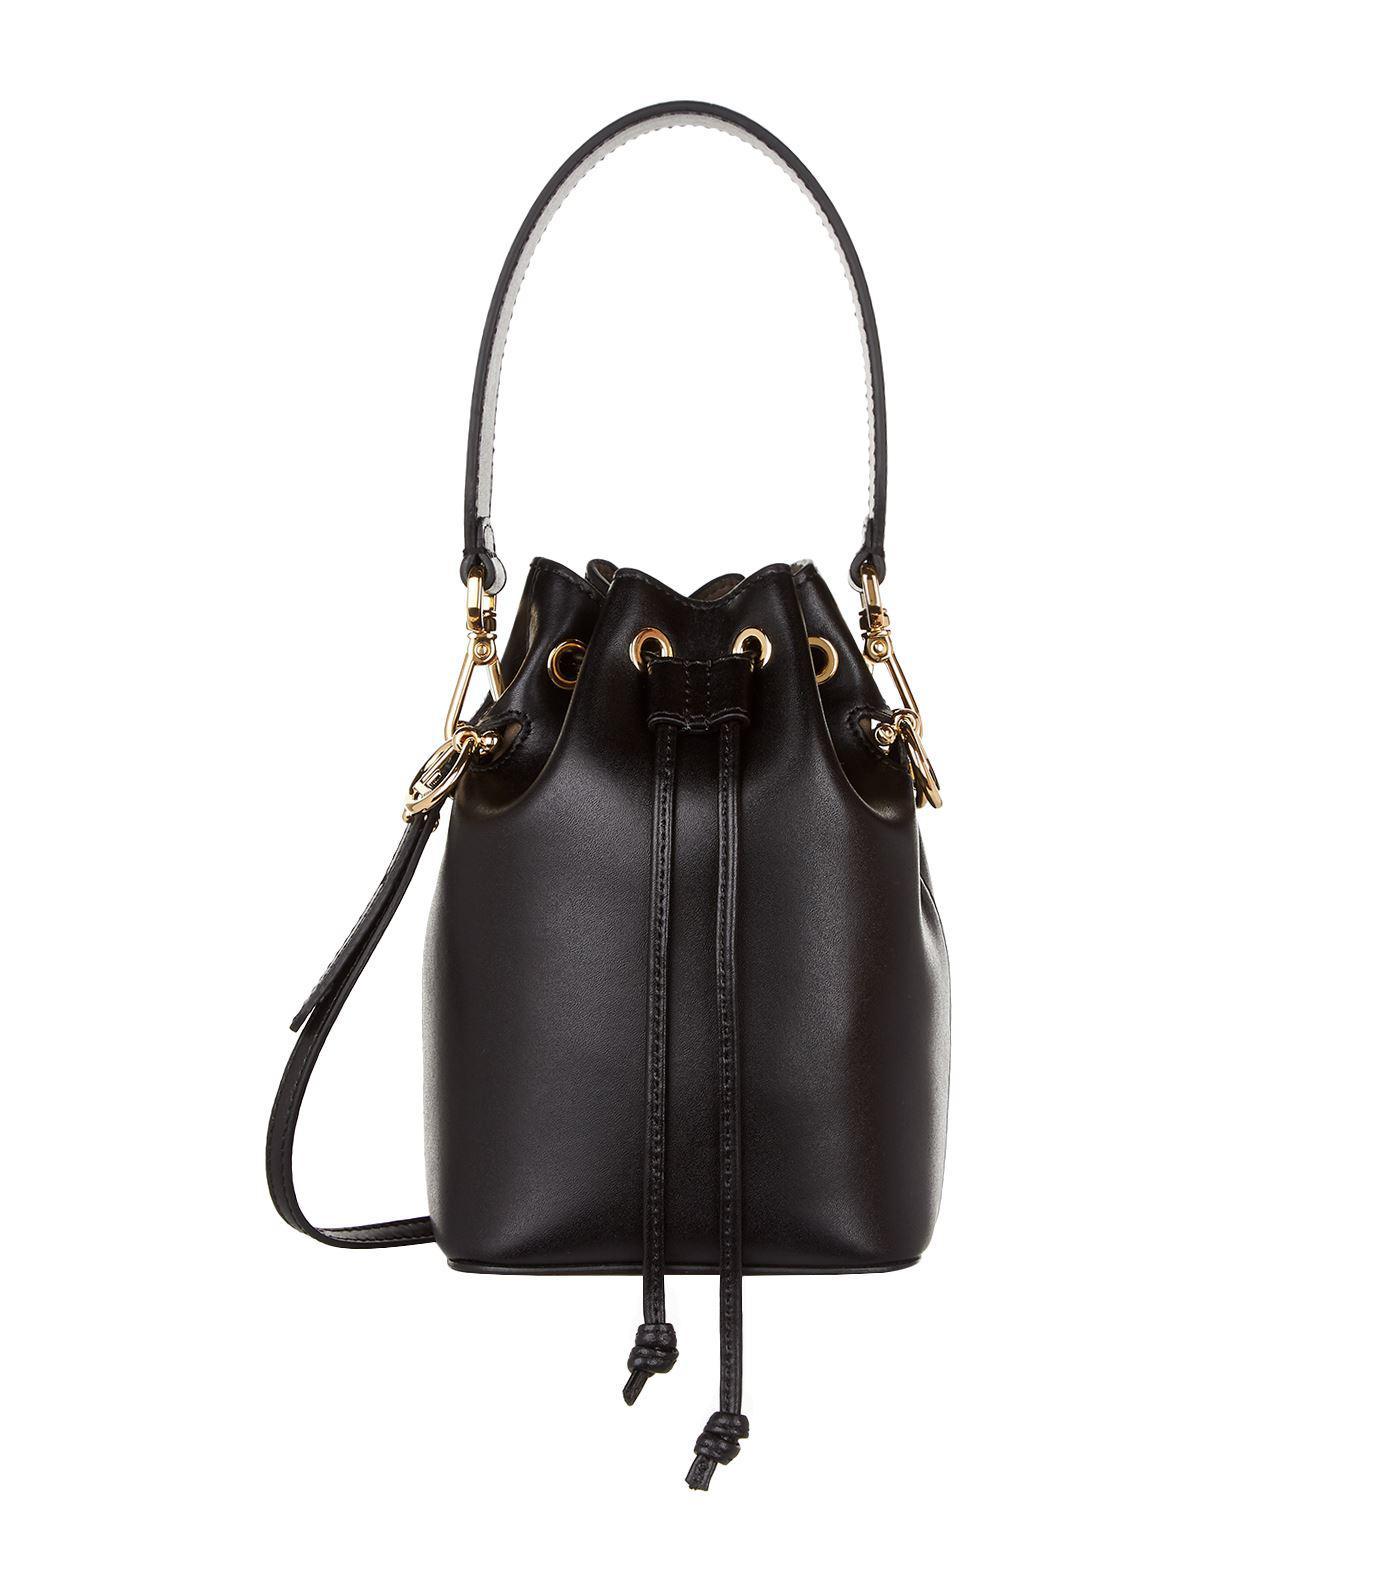 4f2e6e366e27 Fendi Mini Mon Tresor Leather Bucket Bag in Black - Save 10% - Lyst